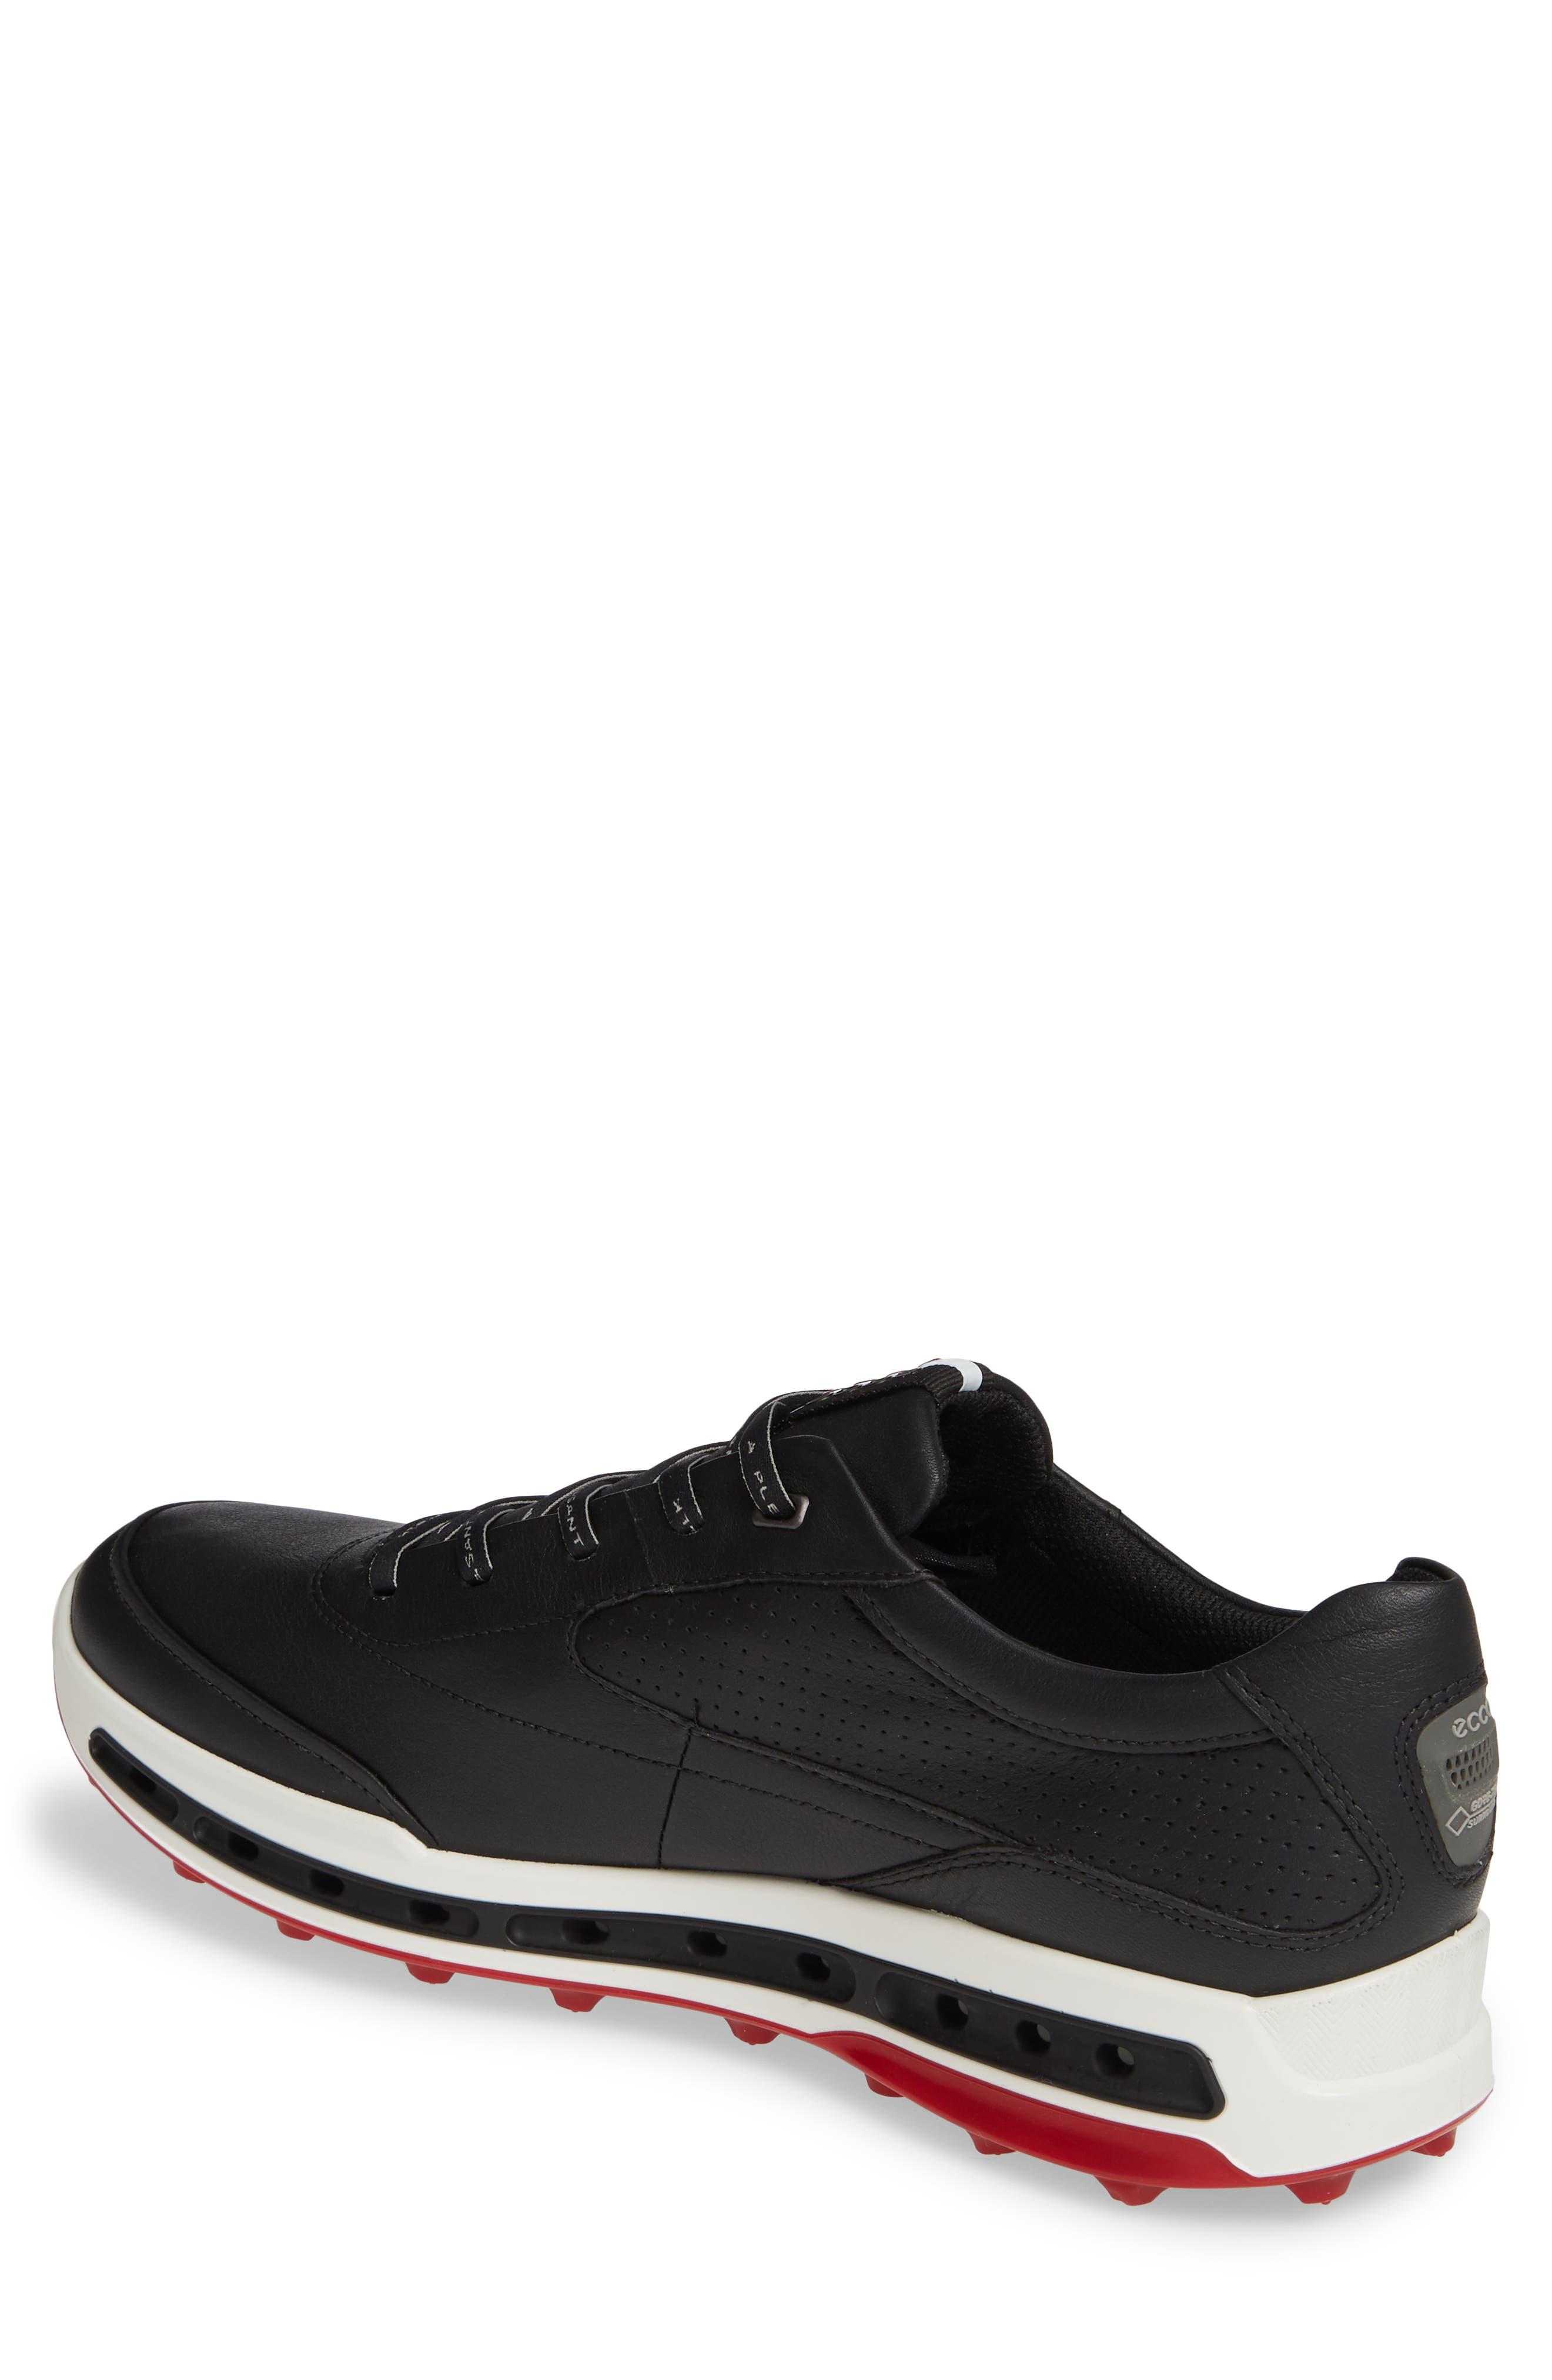 ECCO, Cool Pro Gore-Tex<sup>®</sup> Golf Shoe, Alternate thumbnail 2, color, BLACK/ BRICK LEATHER